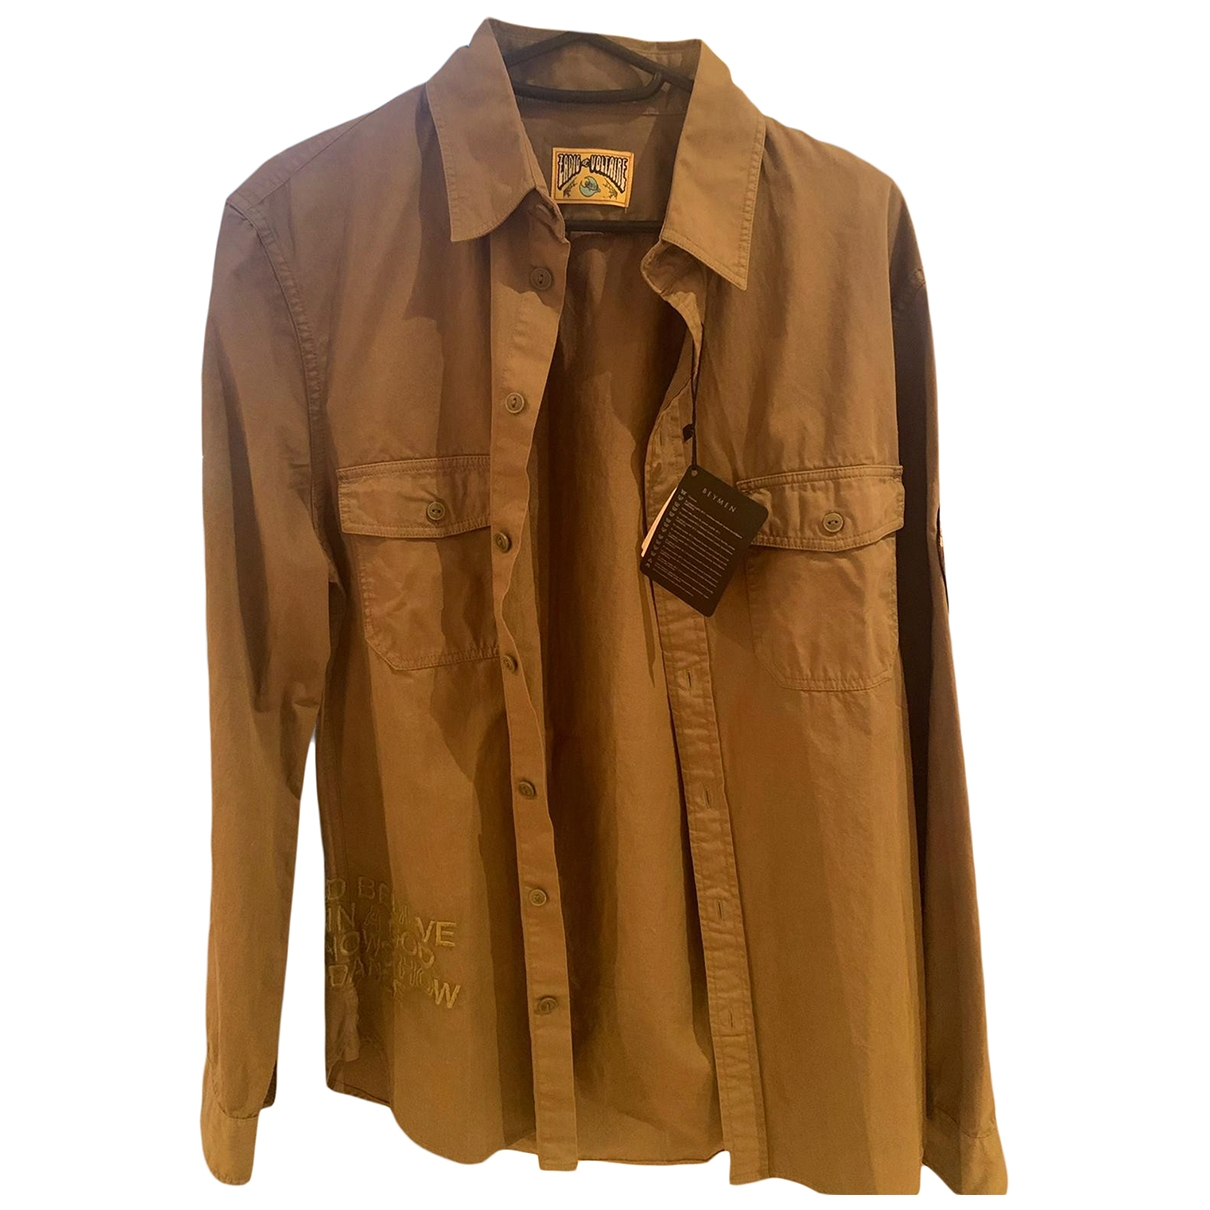 Zadig & Voltaire \N Camel Cotton Shirts for Men 38 EU (tour de cou / collar)